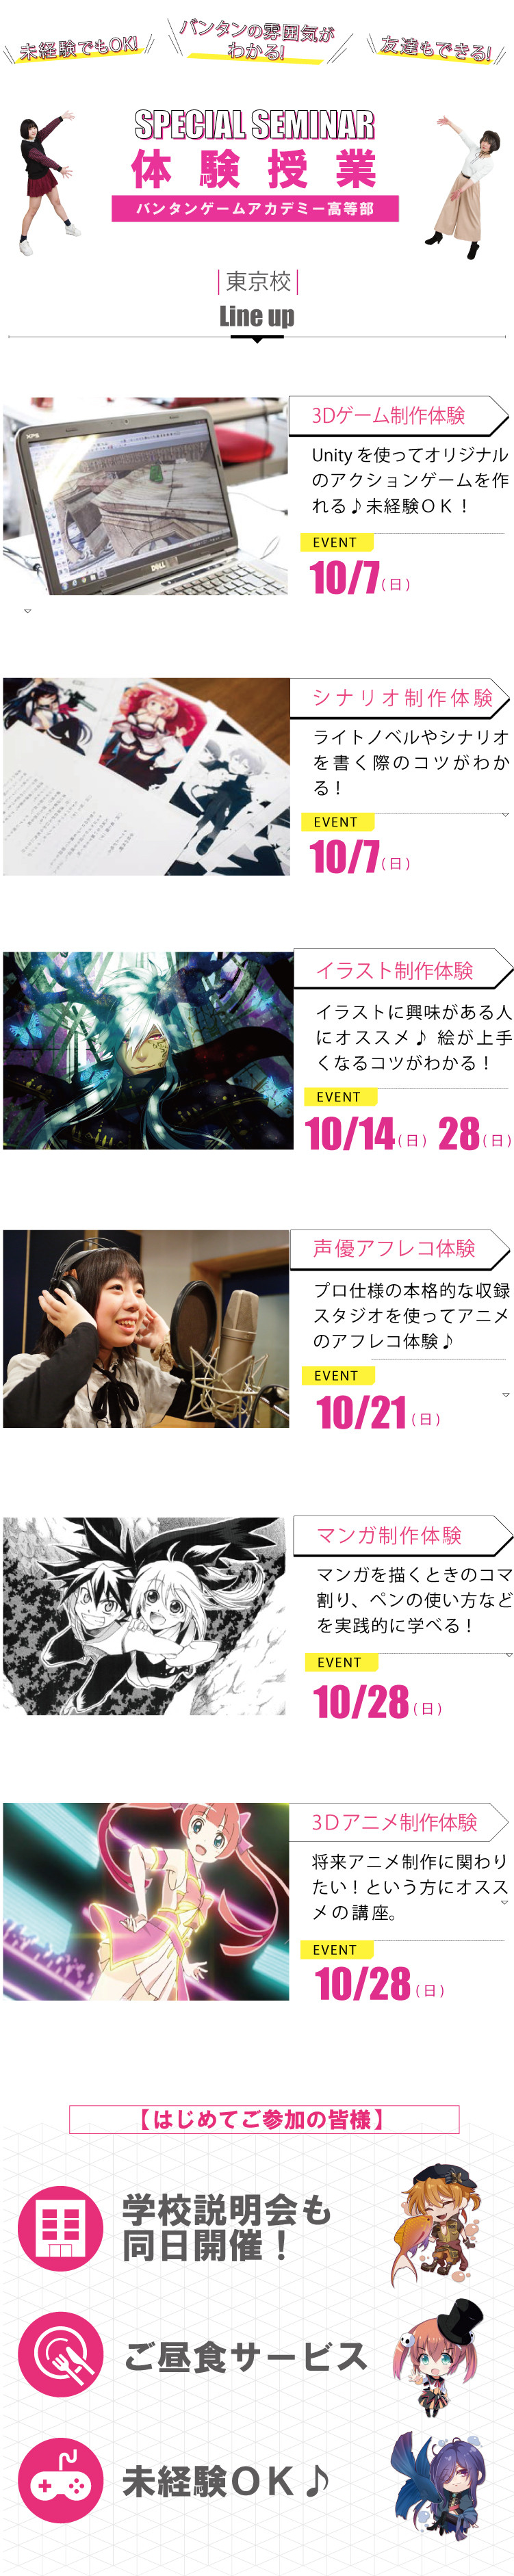 201810_t_naka.jpg